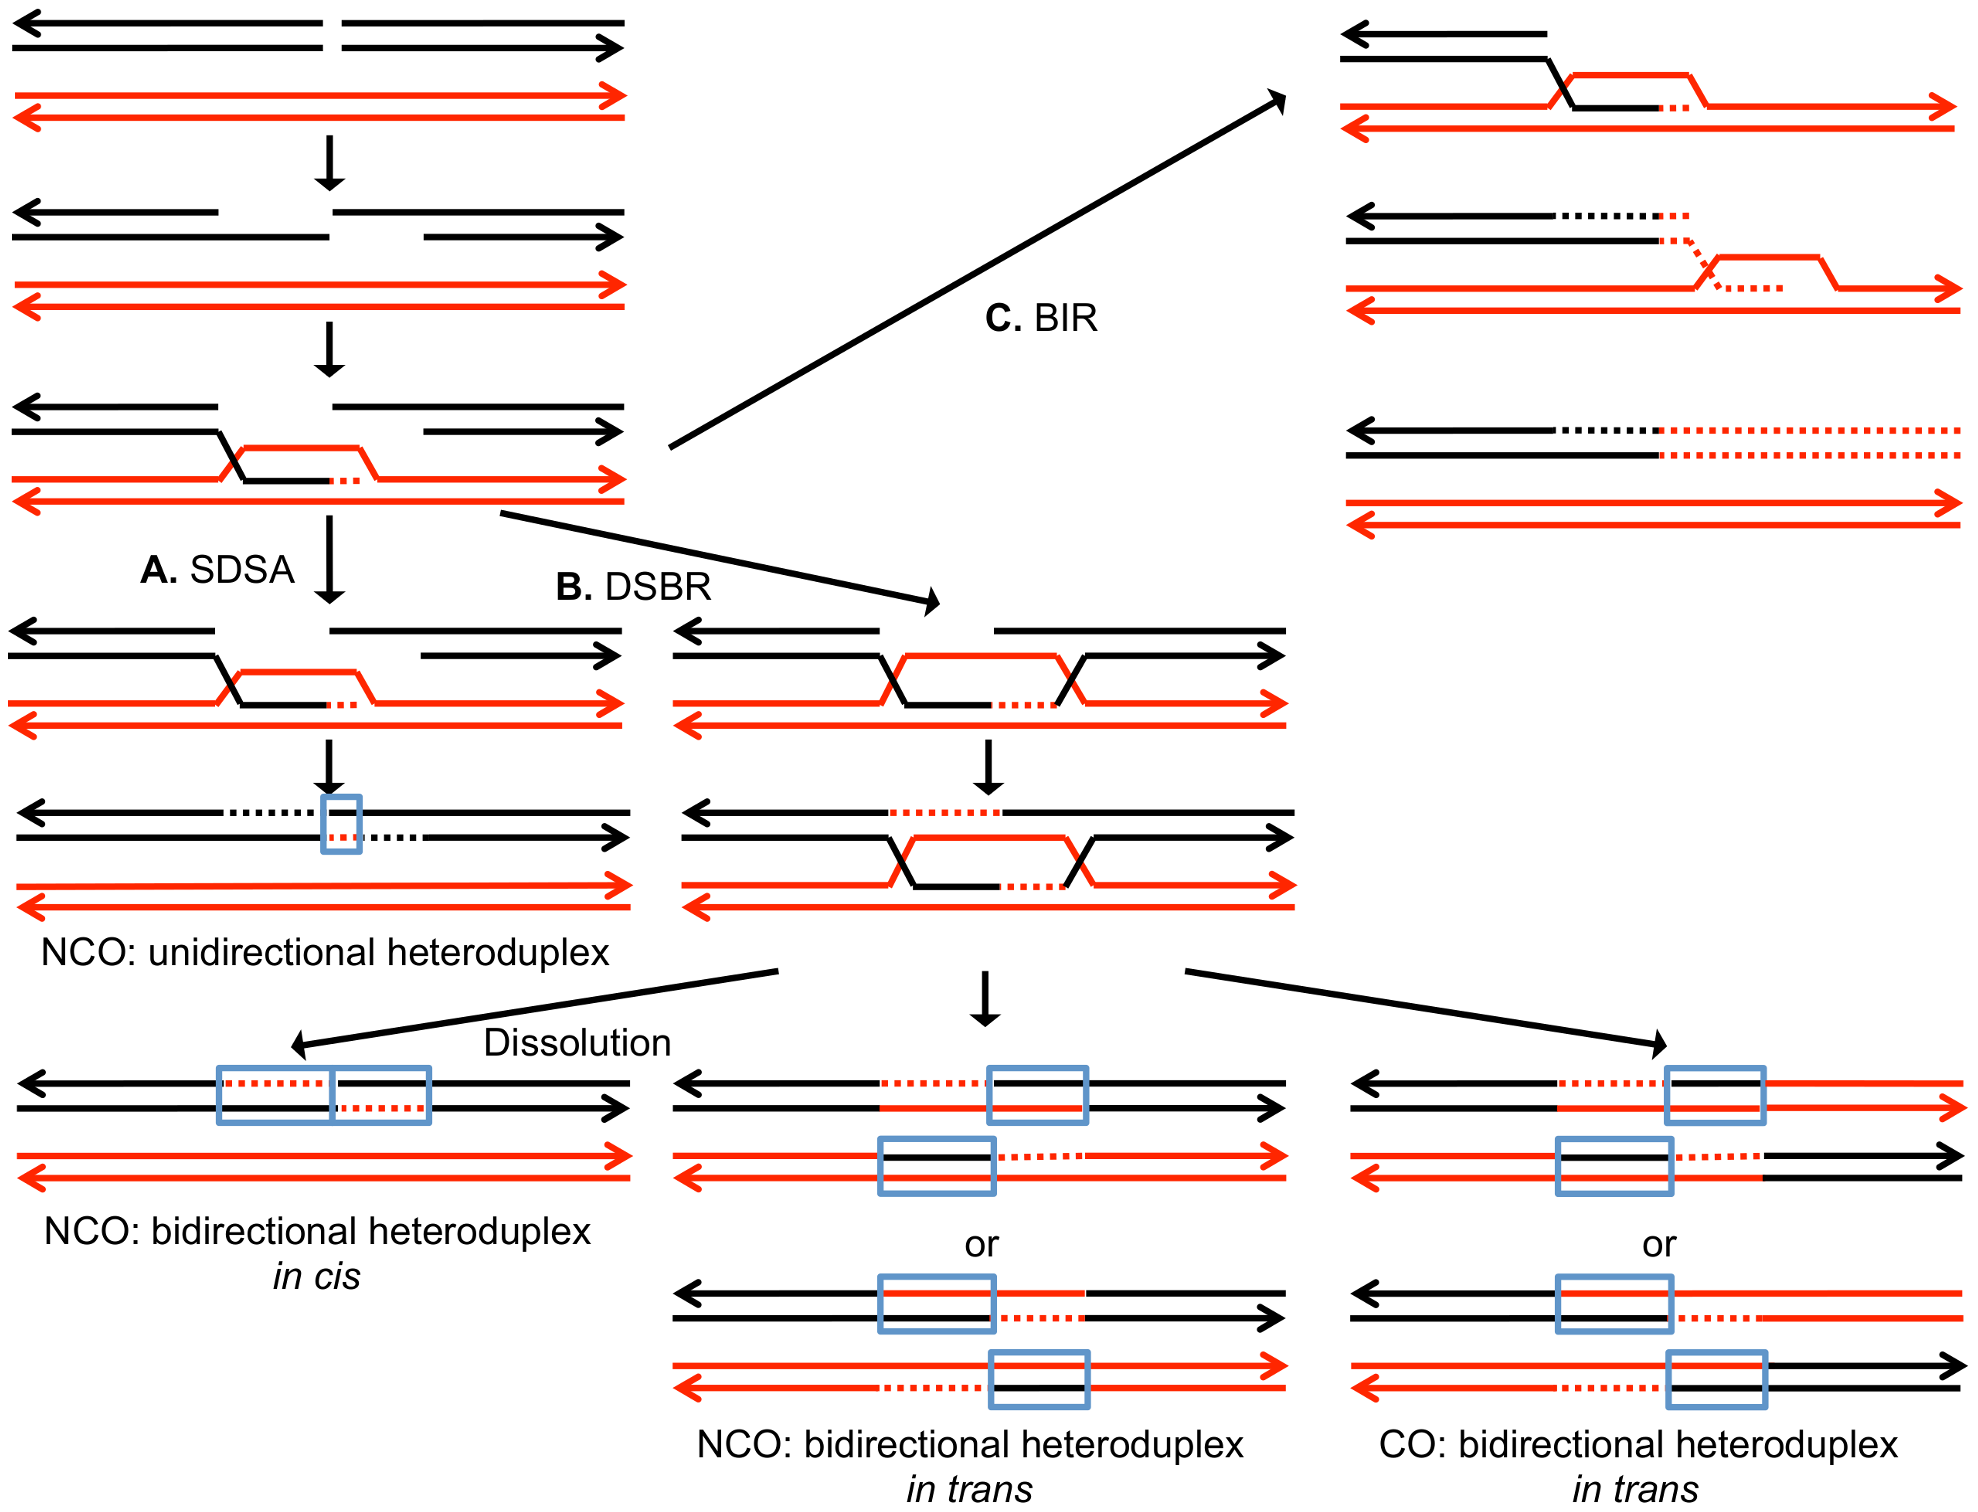 Mechanisms of homologous recombination.